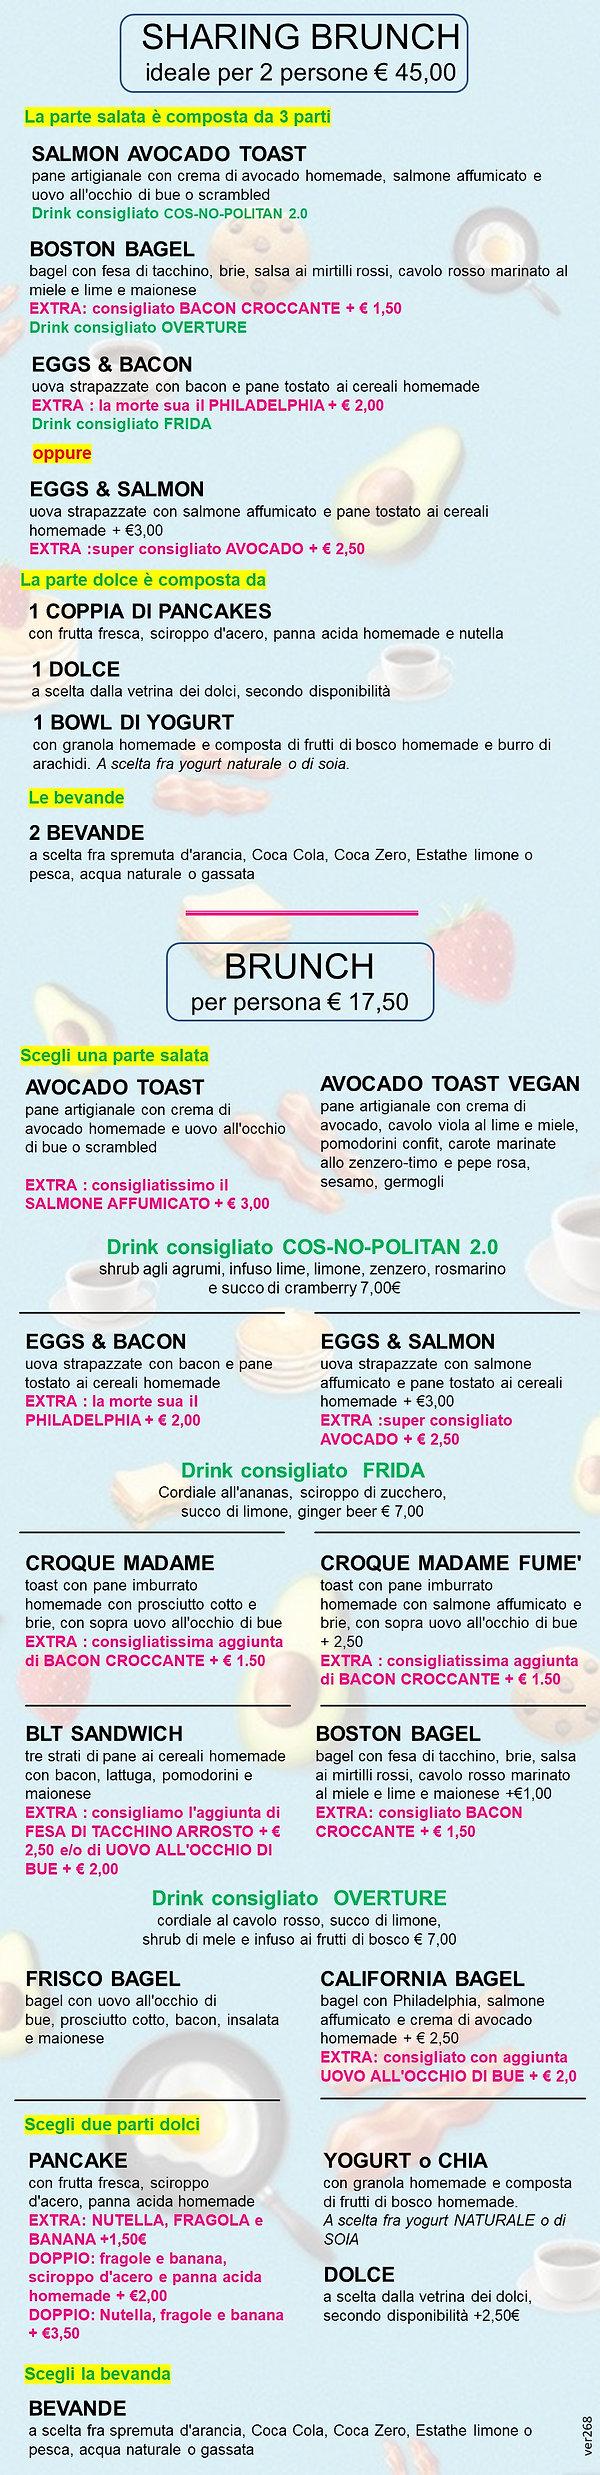 menu checchi BRUNCH E SHARING.jpg